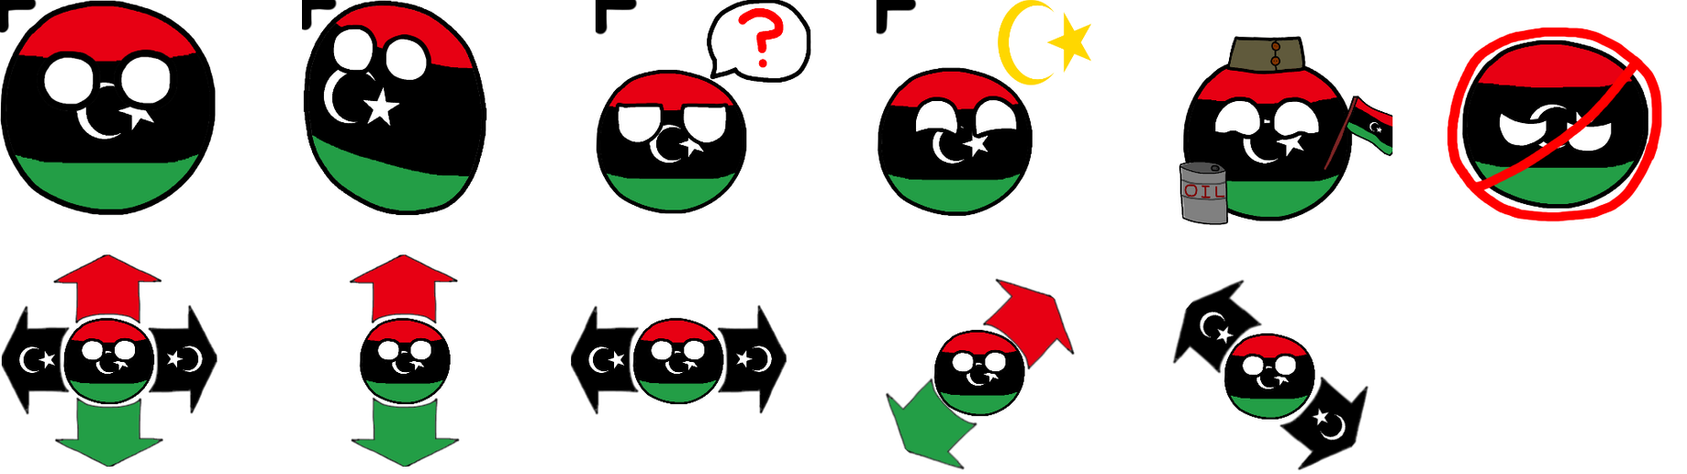 Libia cursor by Cursoresballs